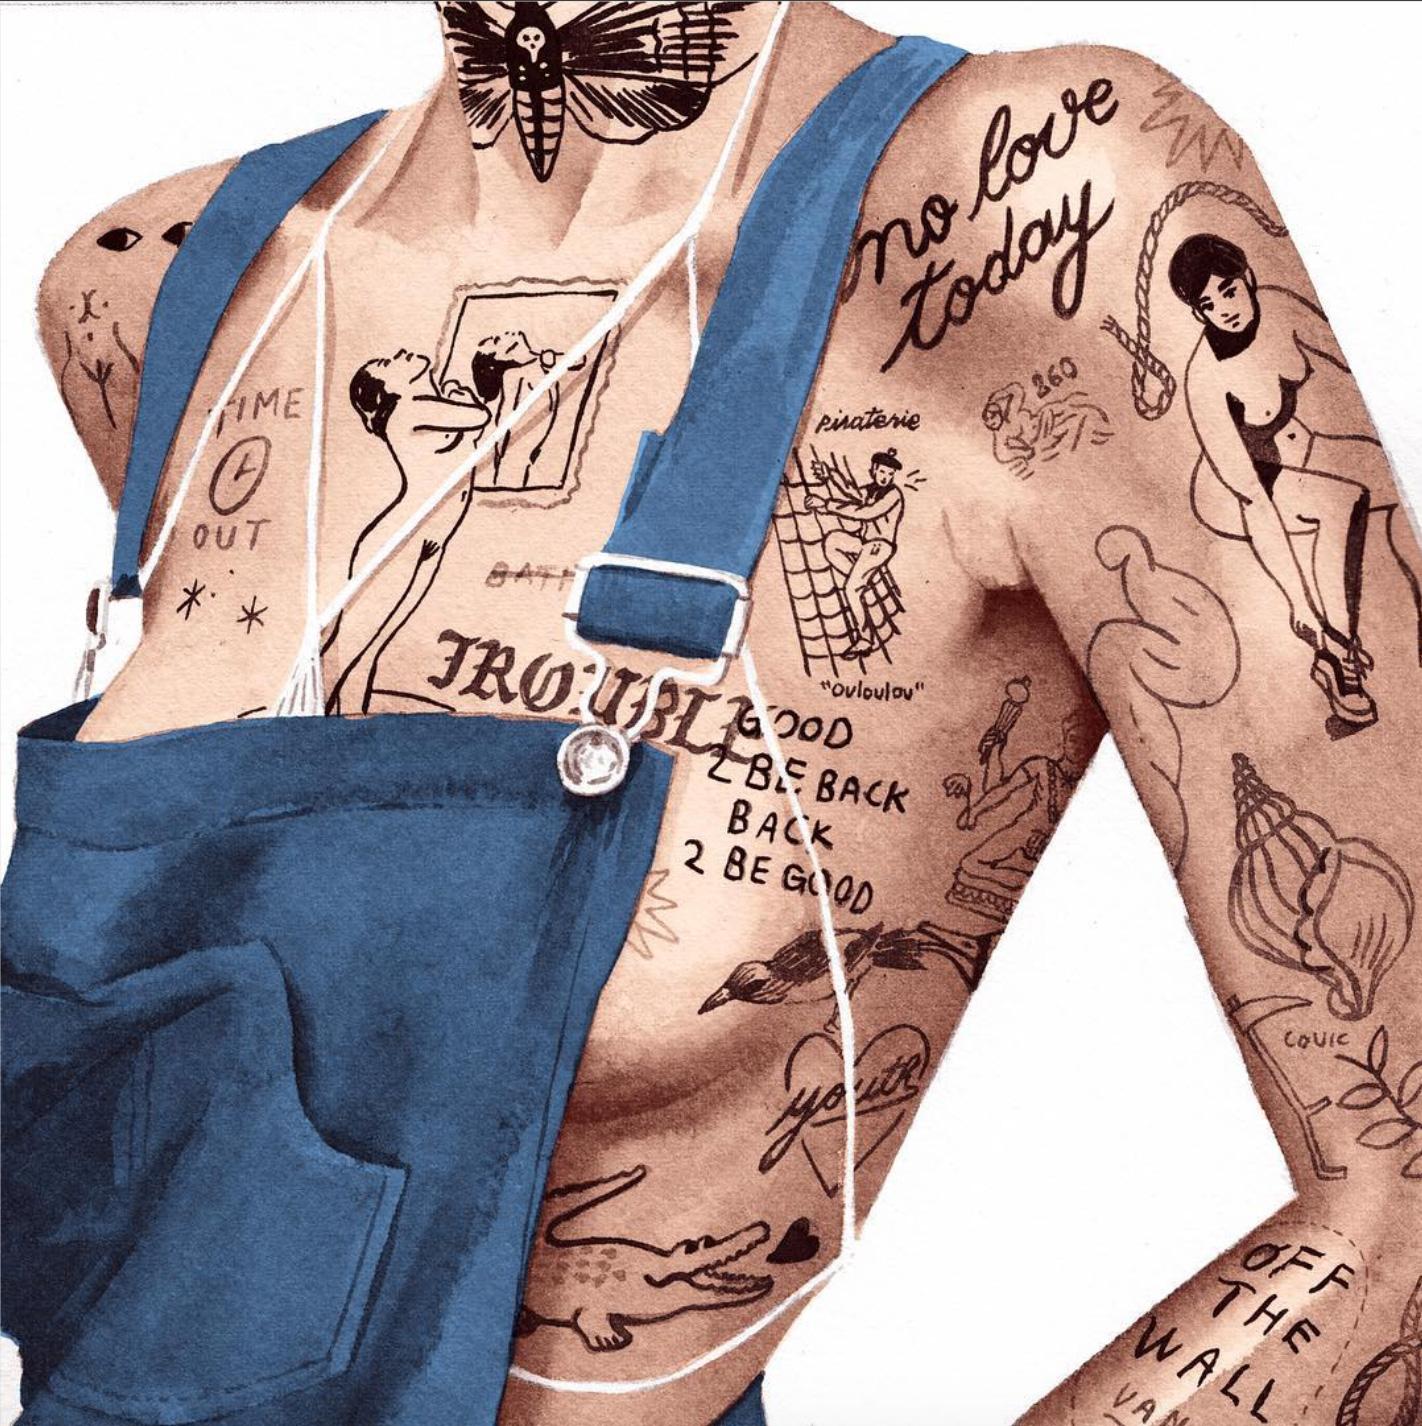 I corpi tatuati NSFW Jean Andre | Collater.al 3